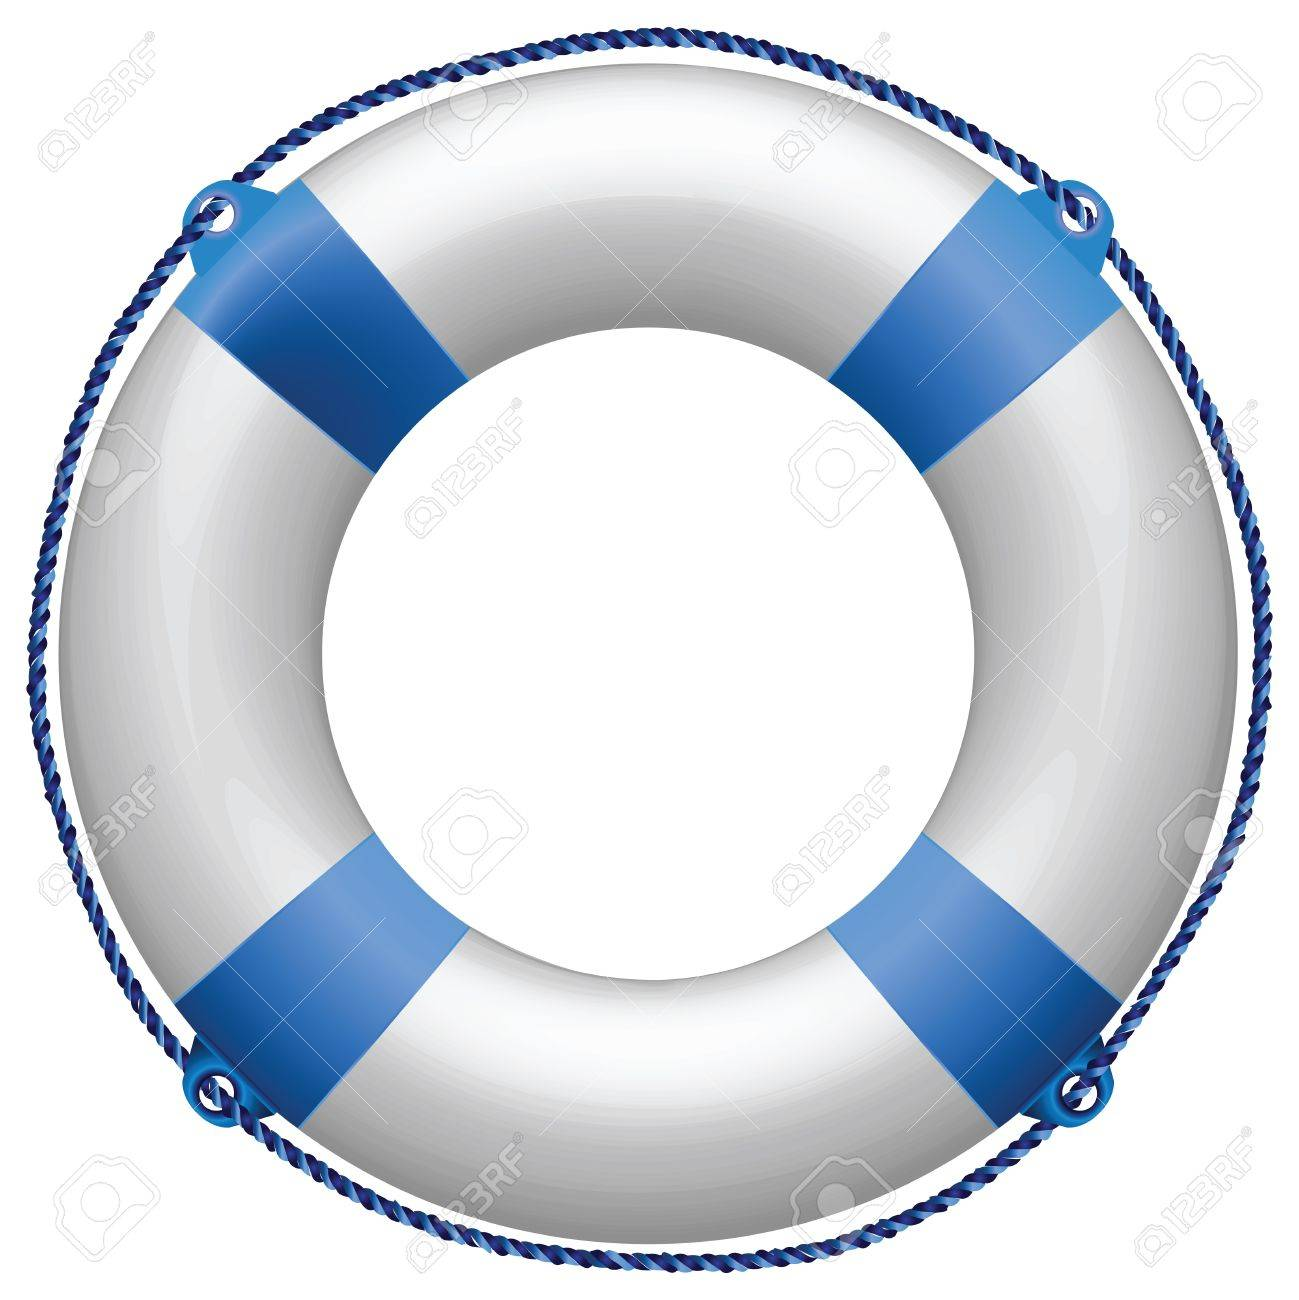 life buoy blue against white background, abstract vector art illustration Stock Illustration - 8545371